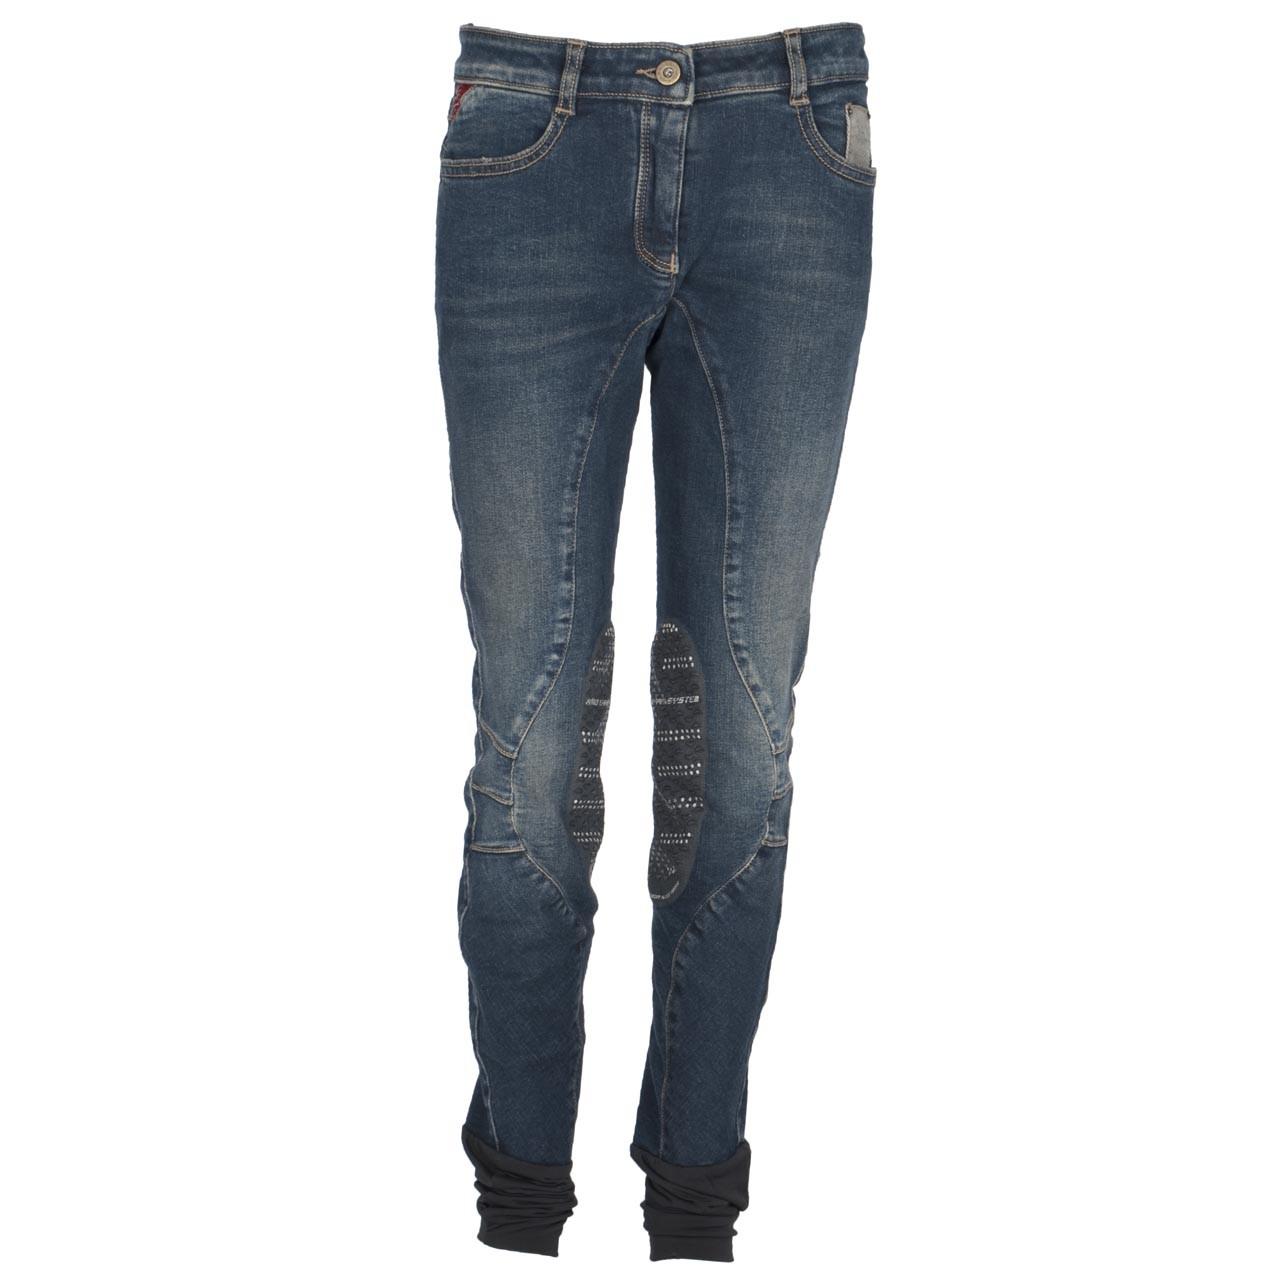 Animo Nabina kinder rijbroek jeans maat:152